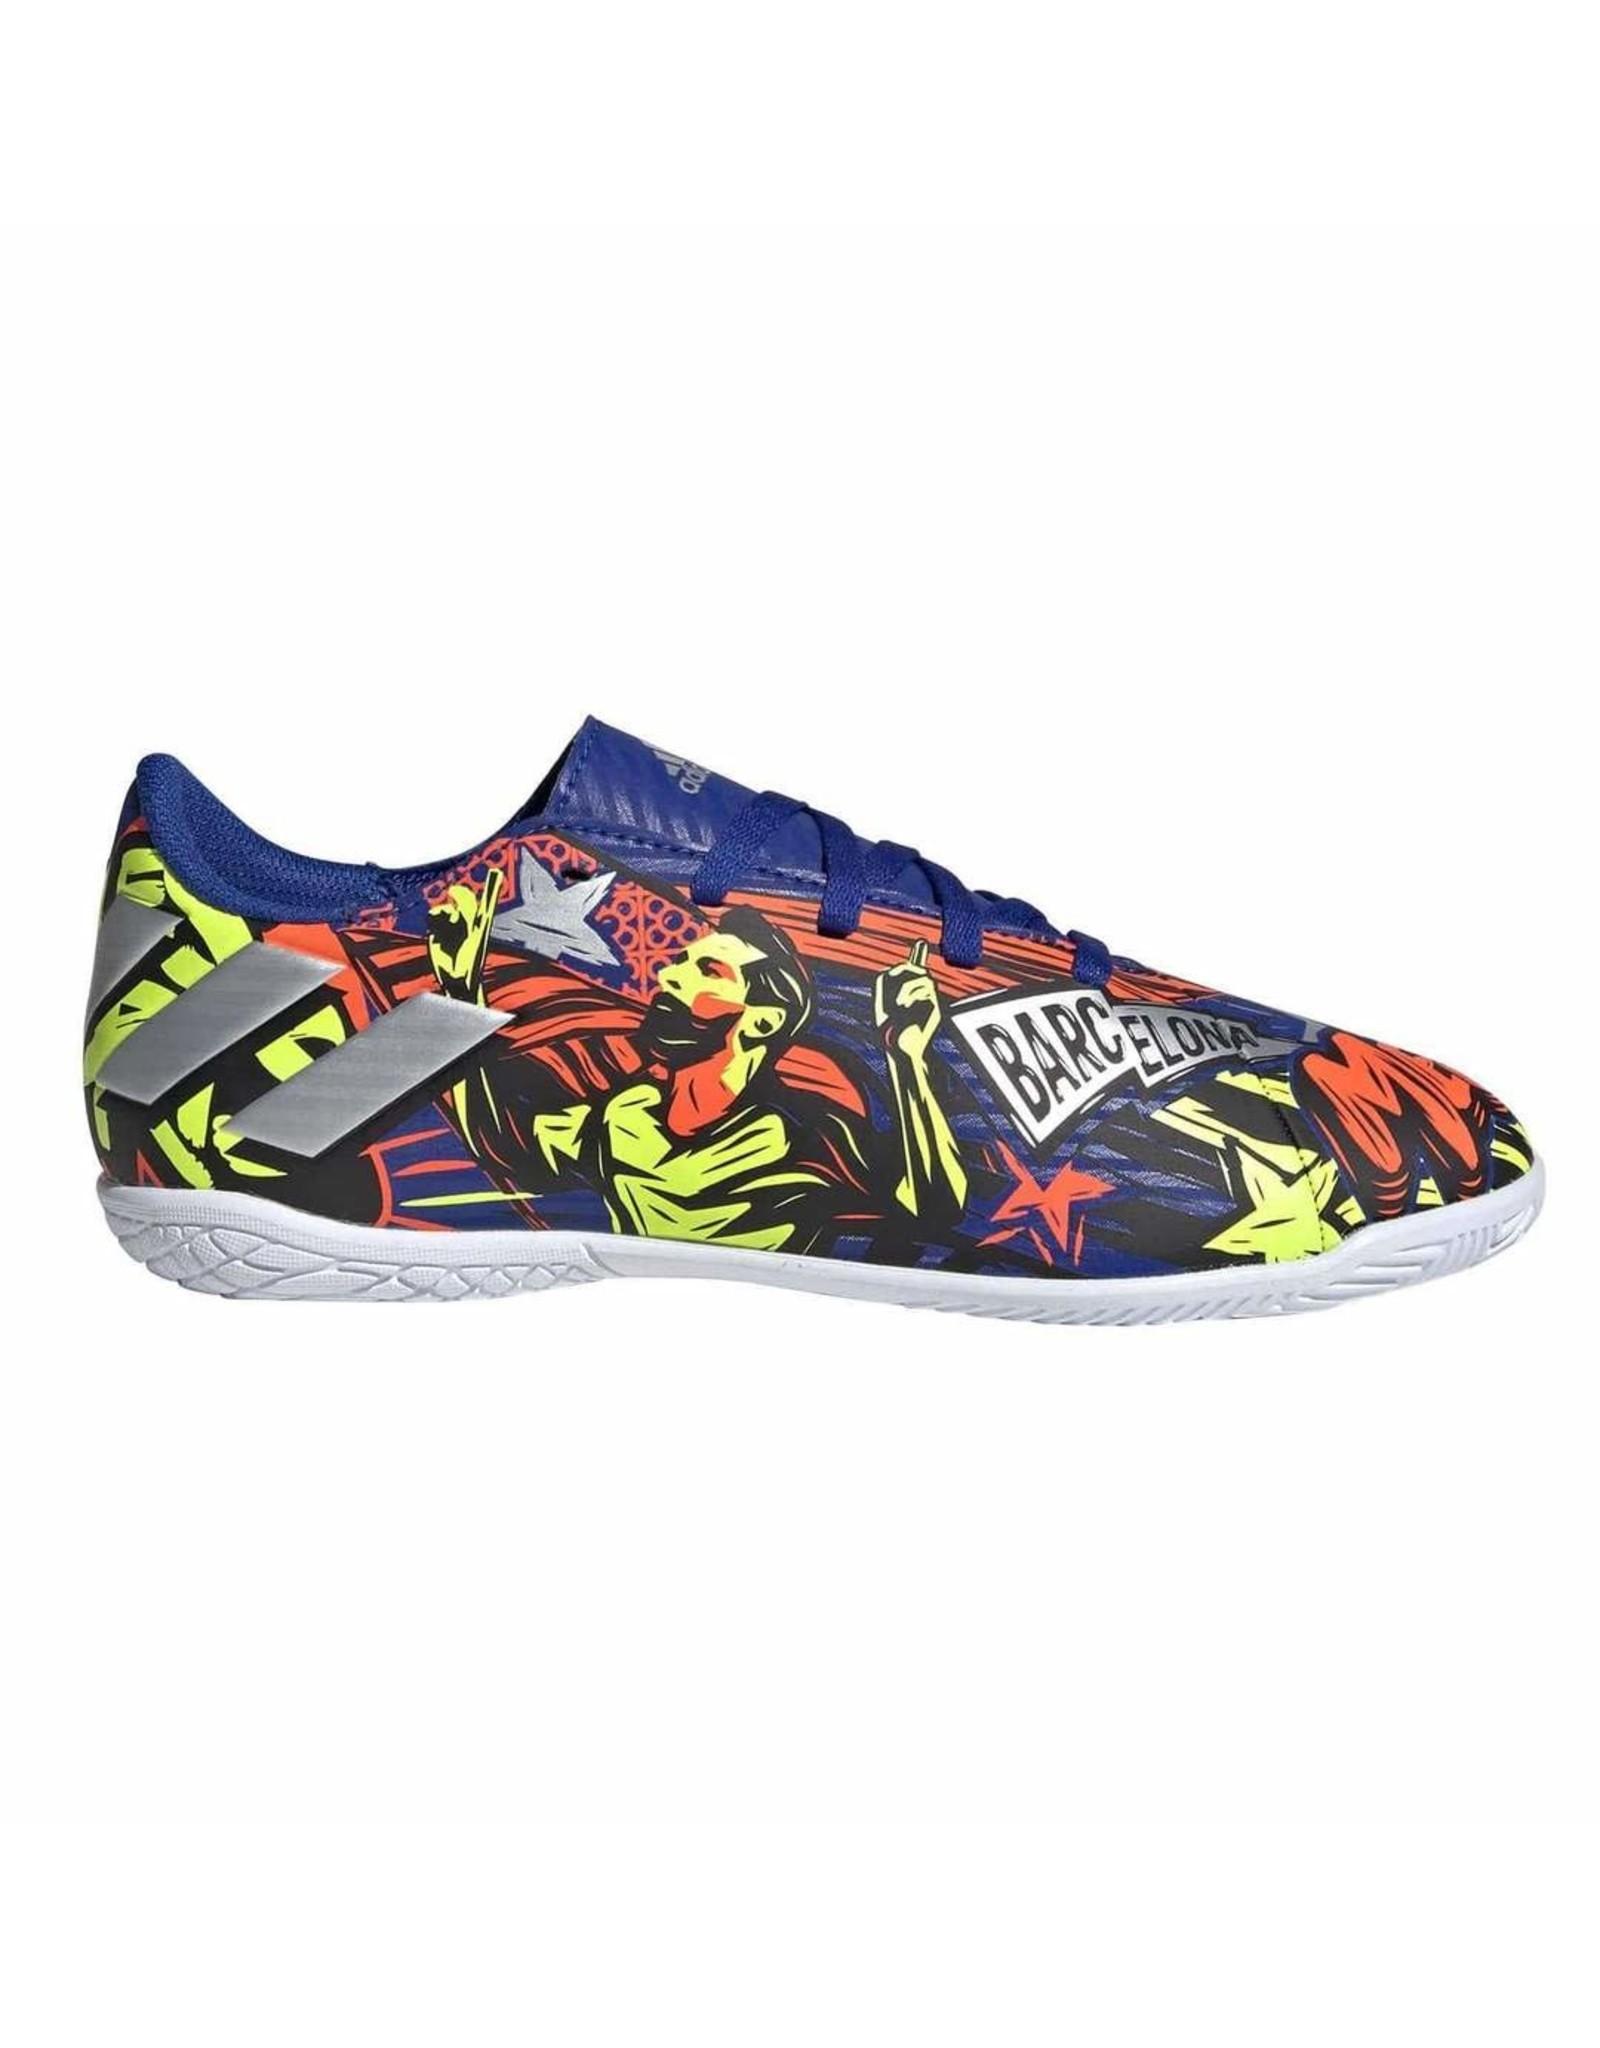 Adidas ADIDAS NEMEZIZ MESSI 19.4 IN J (ROYBLU/SILVMT/SYELLO)